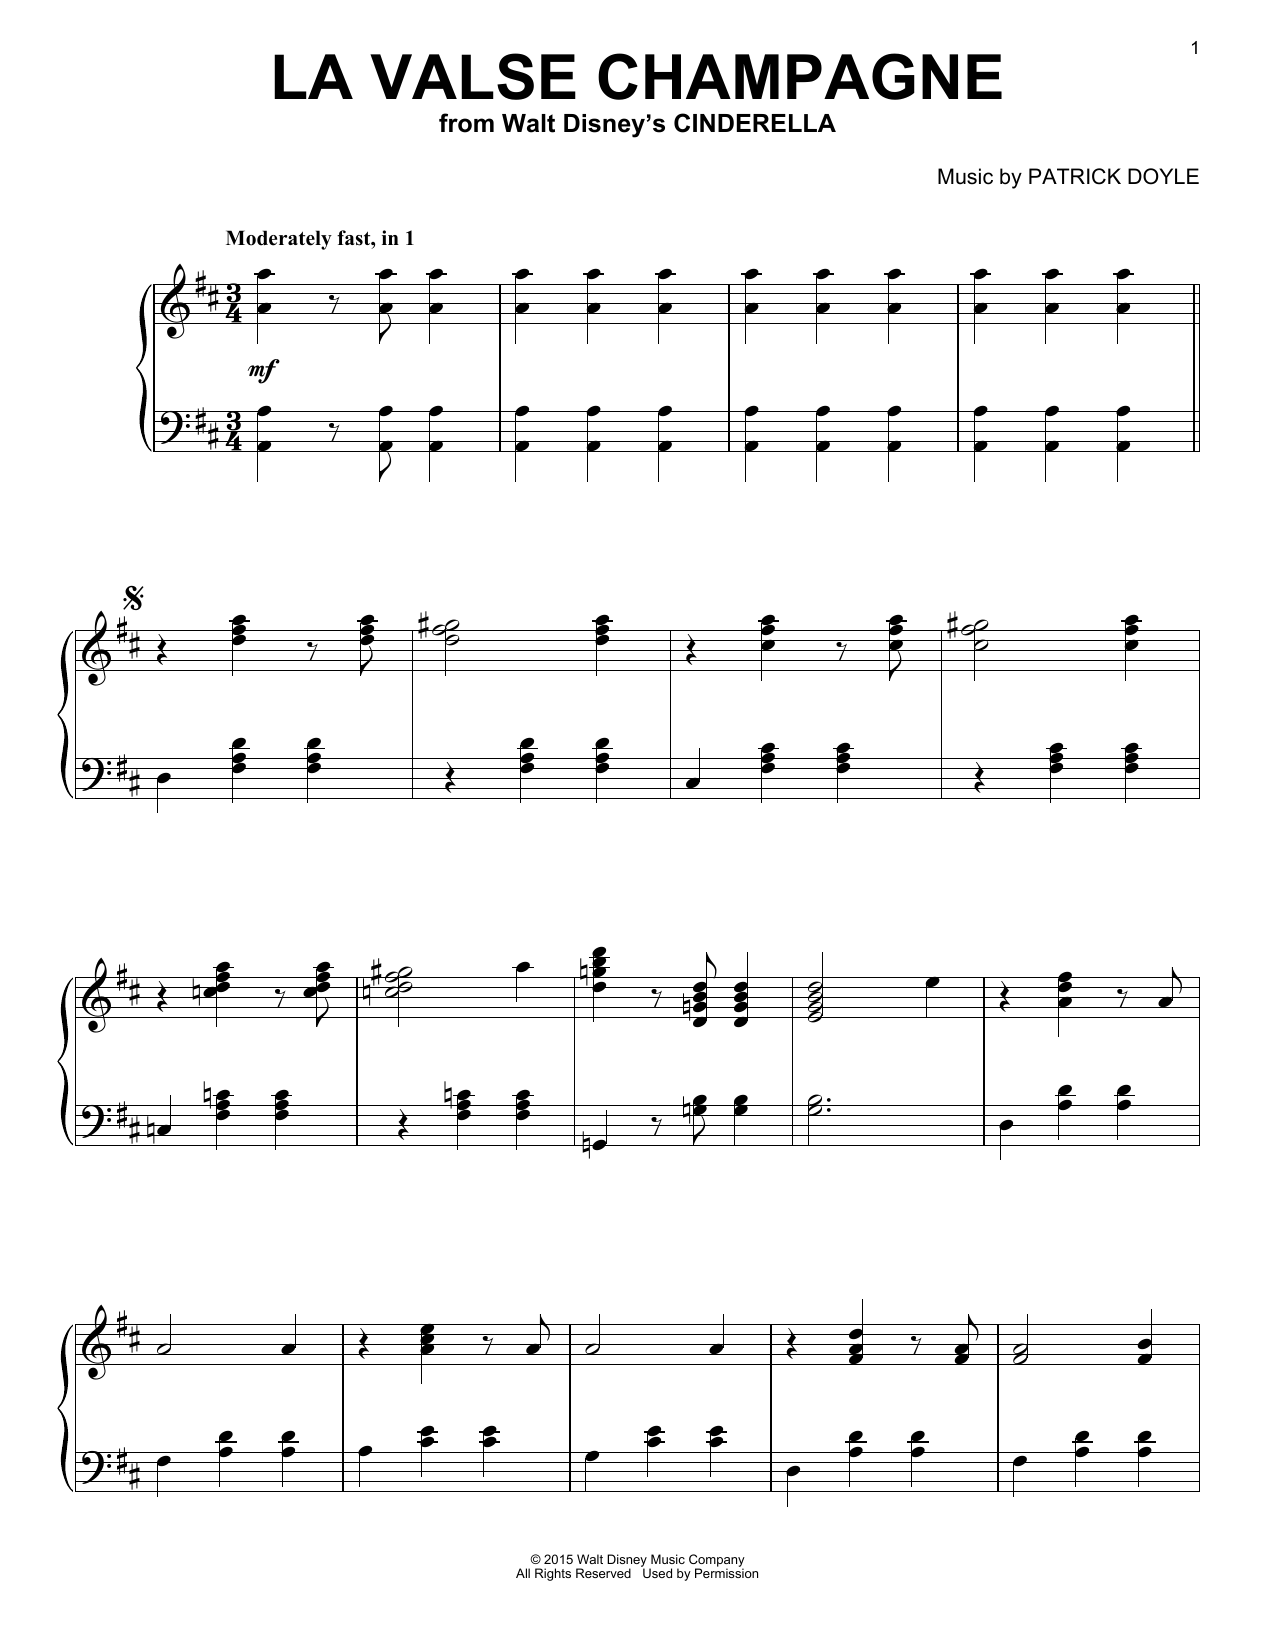 La Valse Champagne (from Walt Disney's Cinderella) Sheet Music